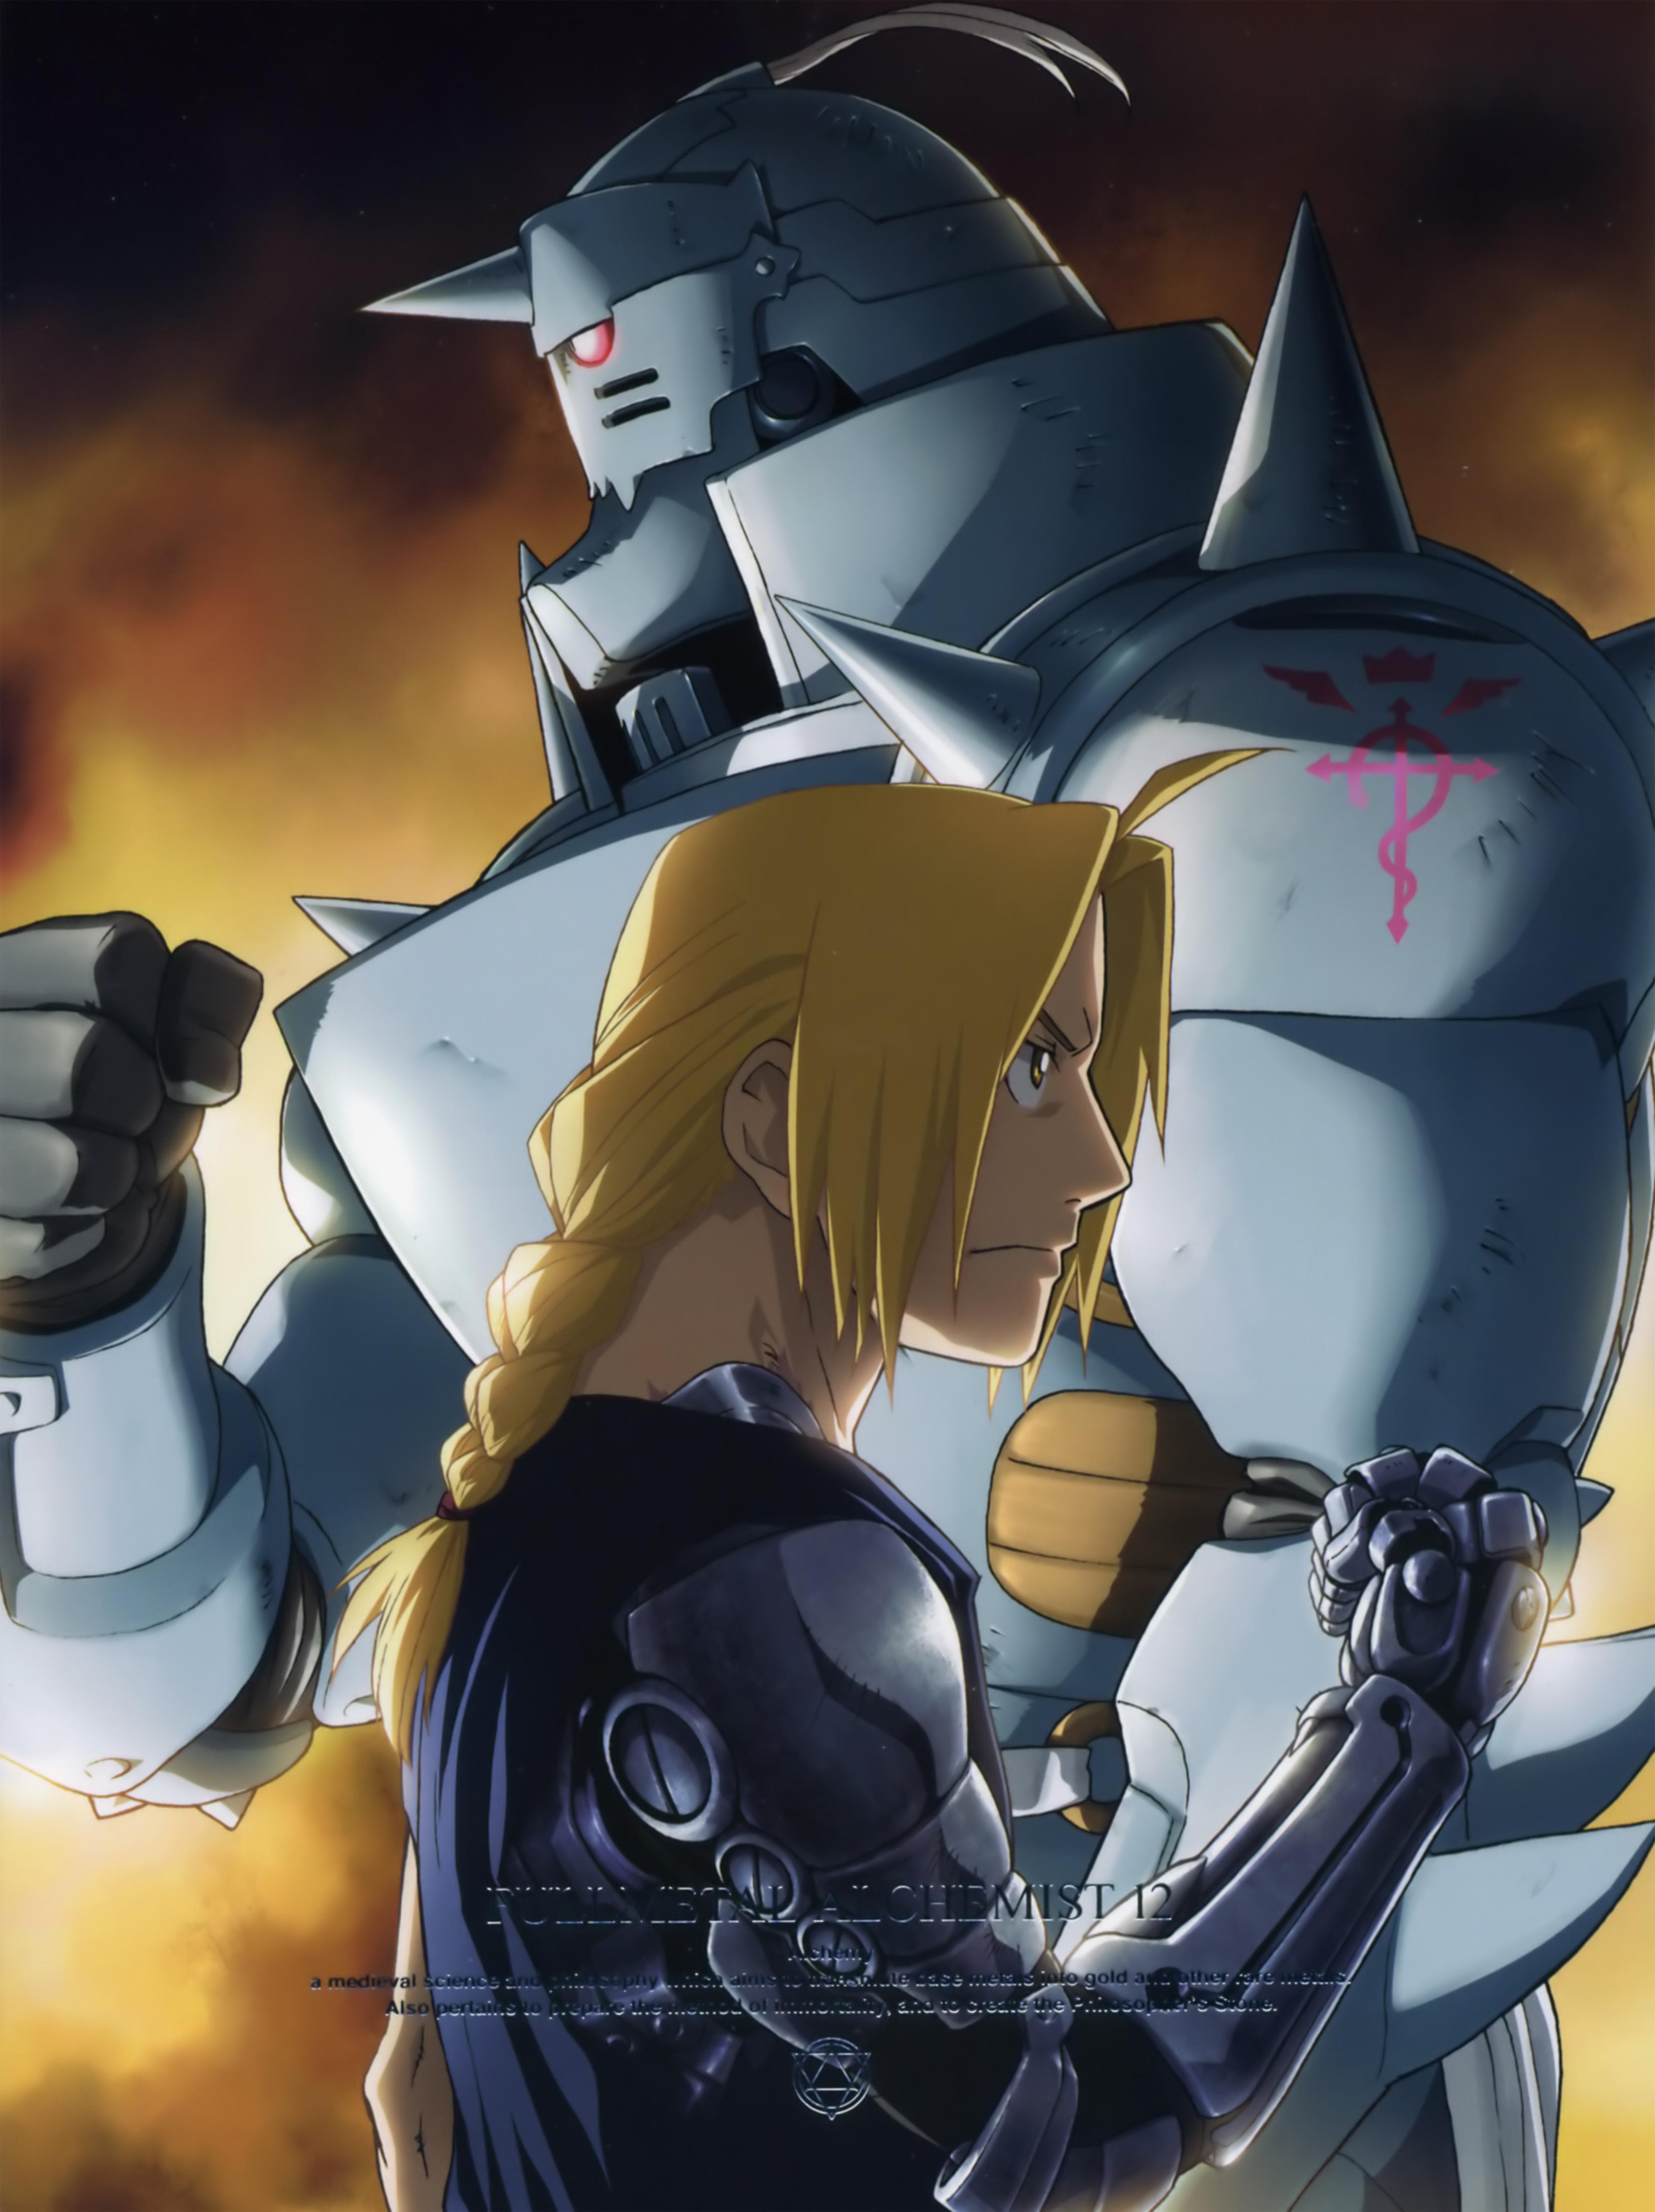 Image Alphonse Elric Edward Elric Fullmetal Alchemist